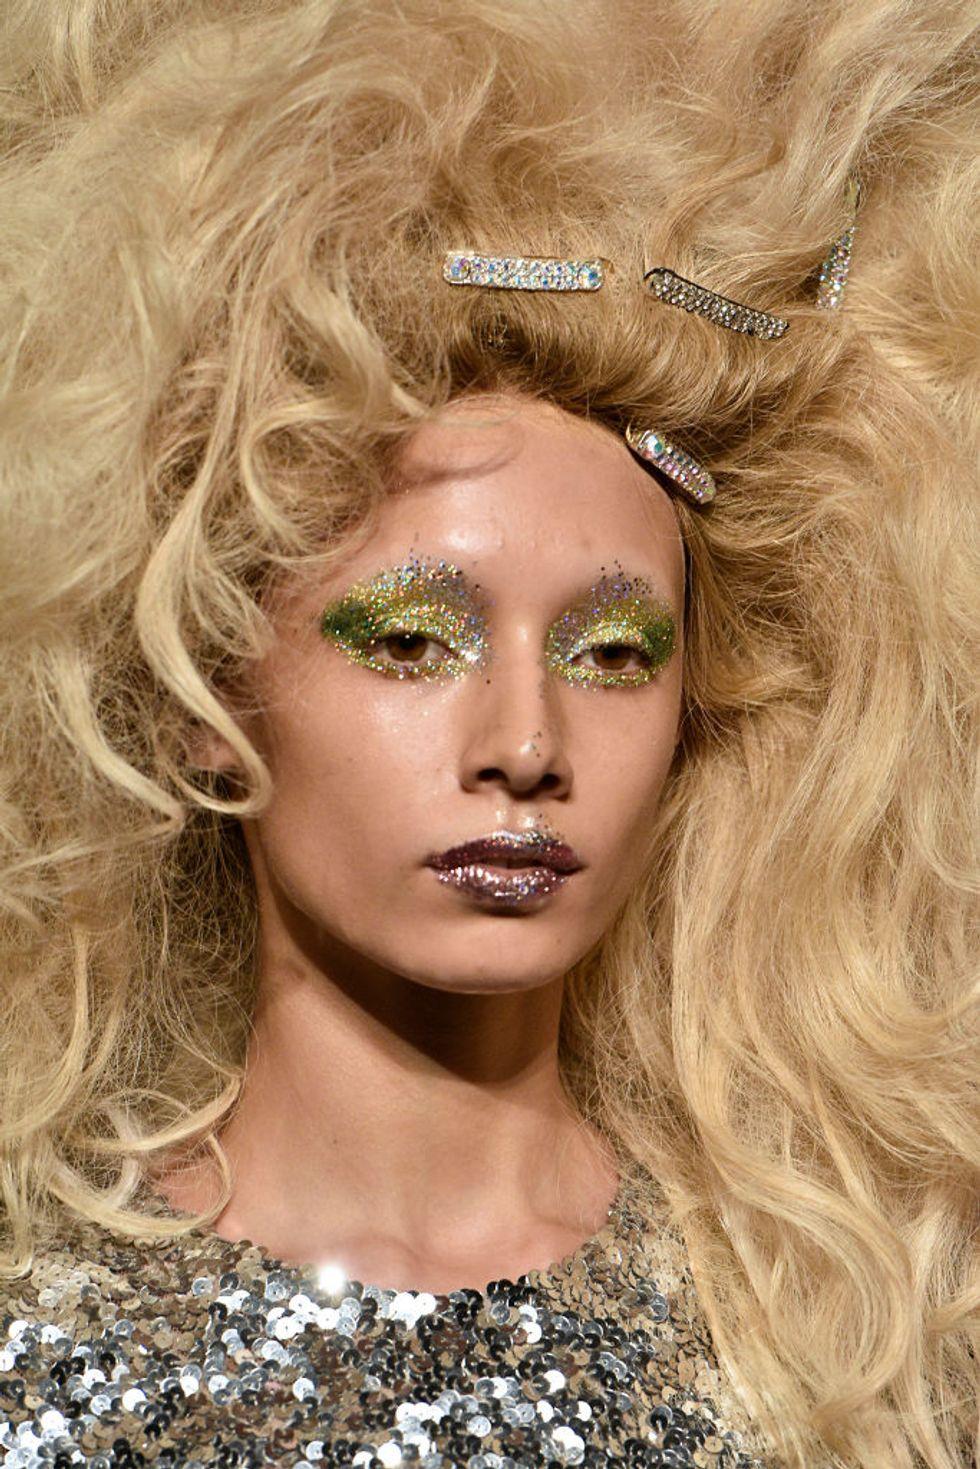 tendencias-beauty-otono-lucir-ya purpurina